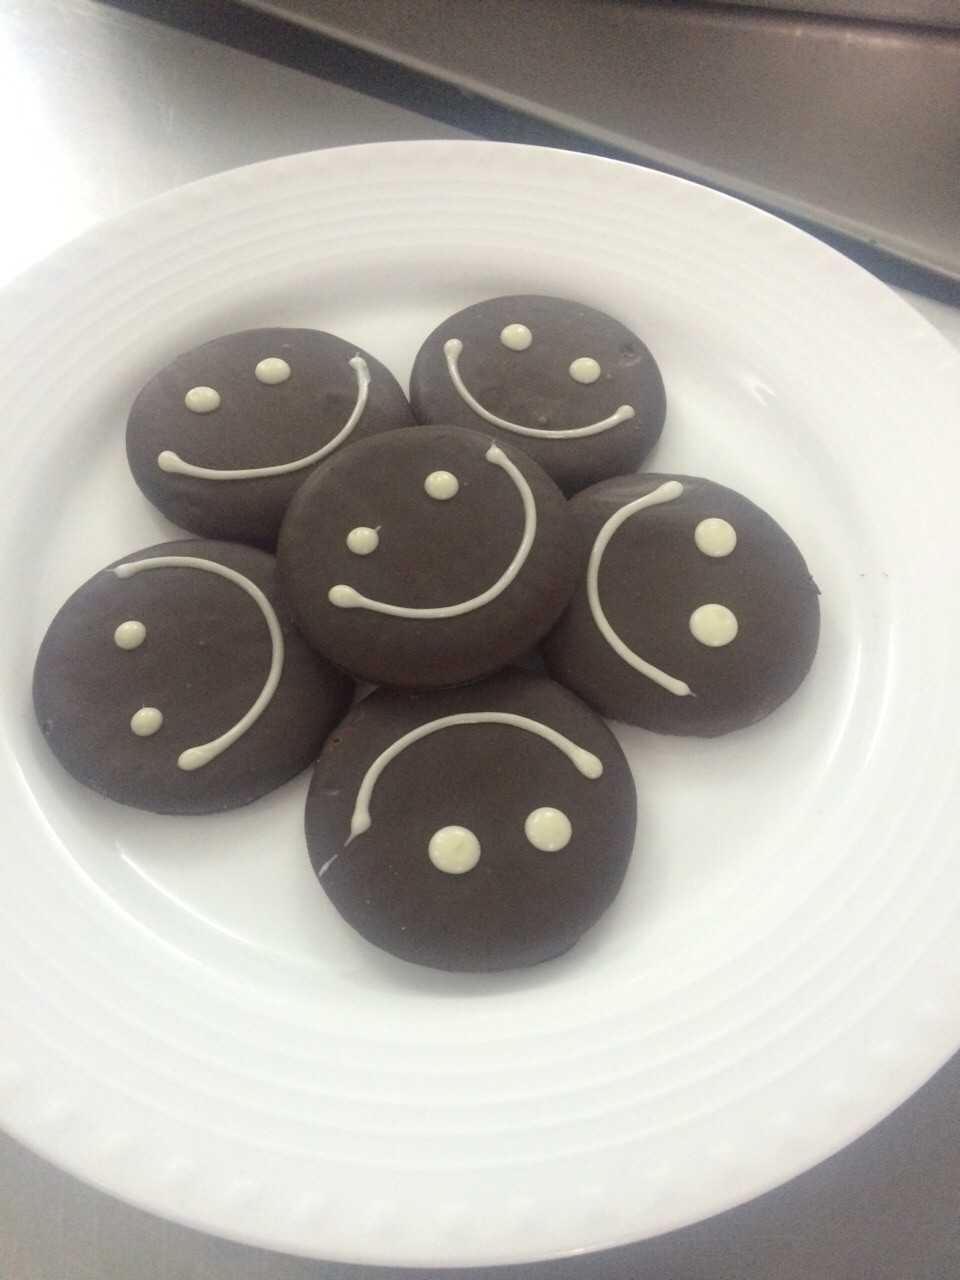 Unibic Chocolate Smilie